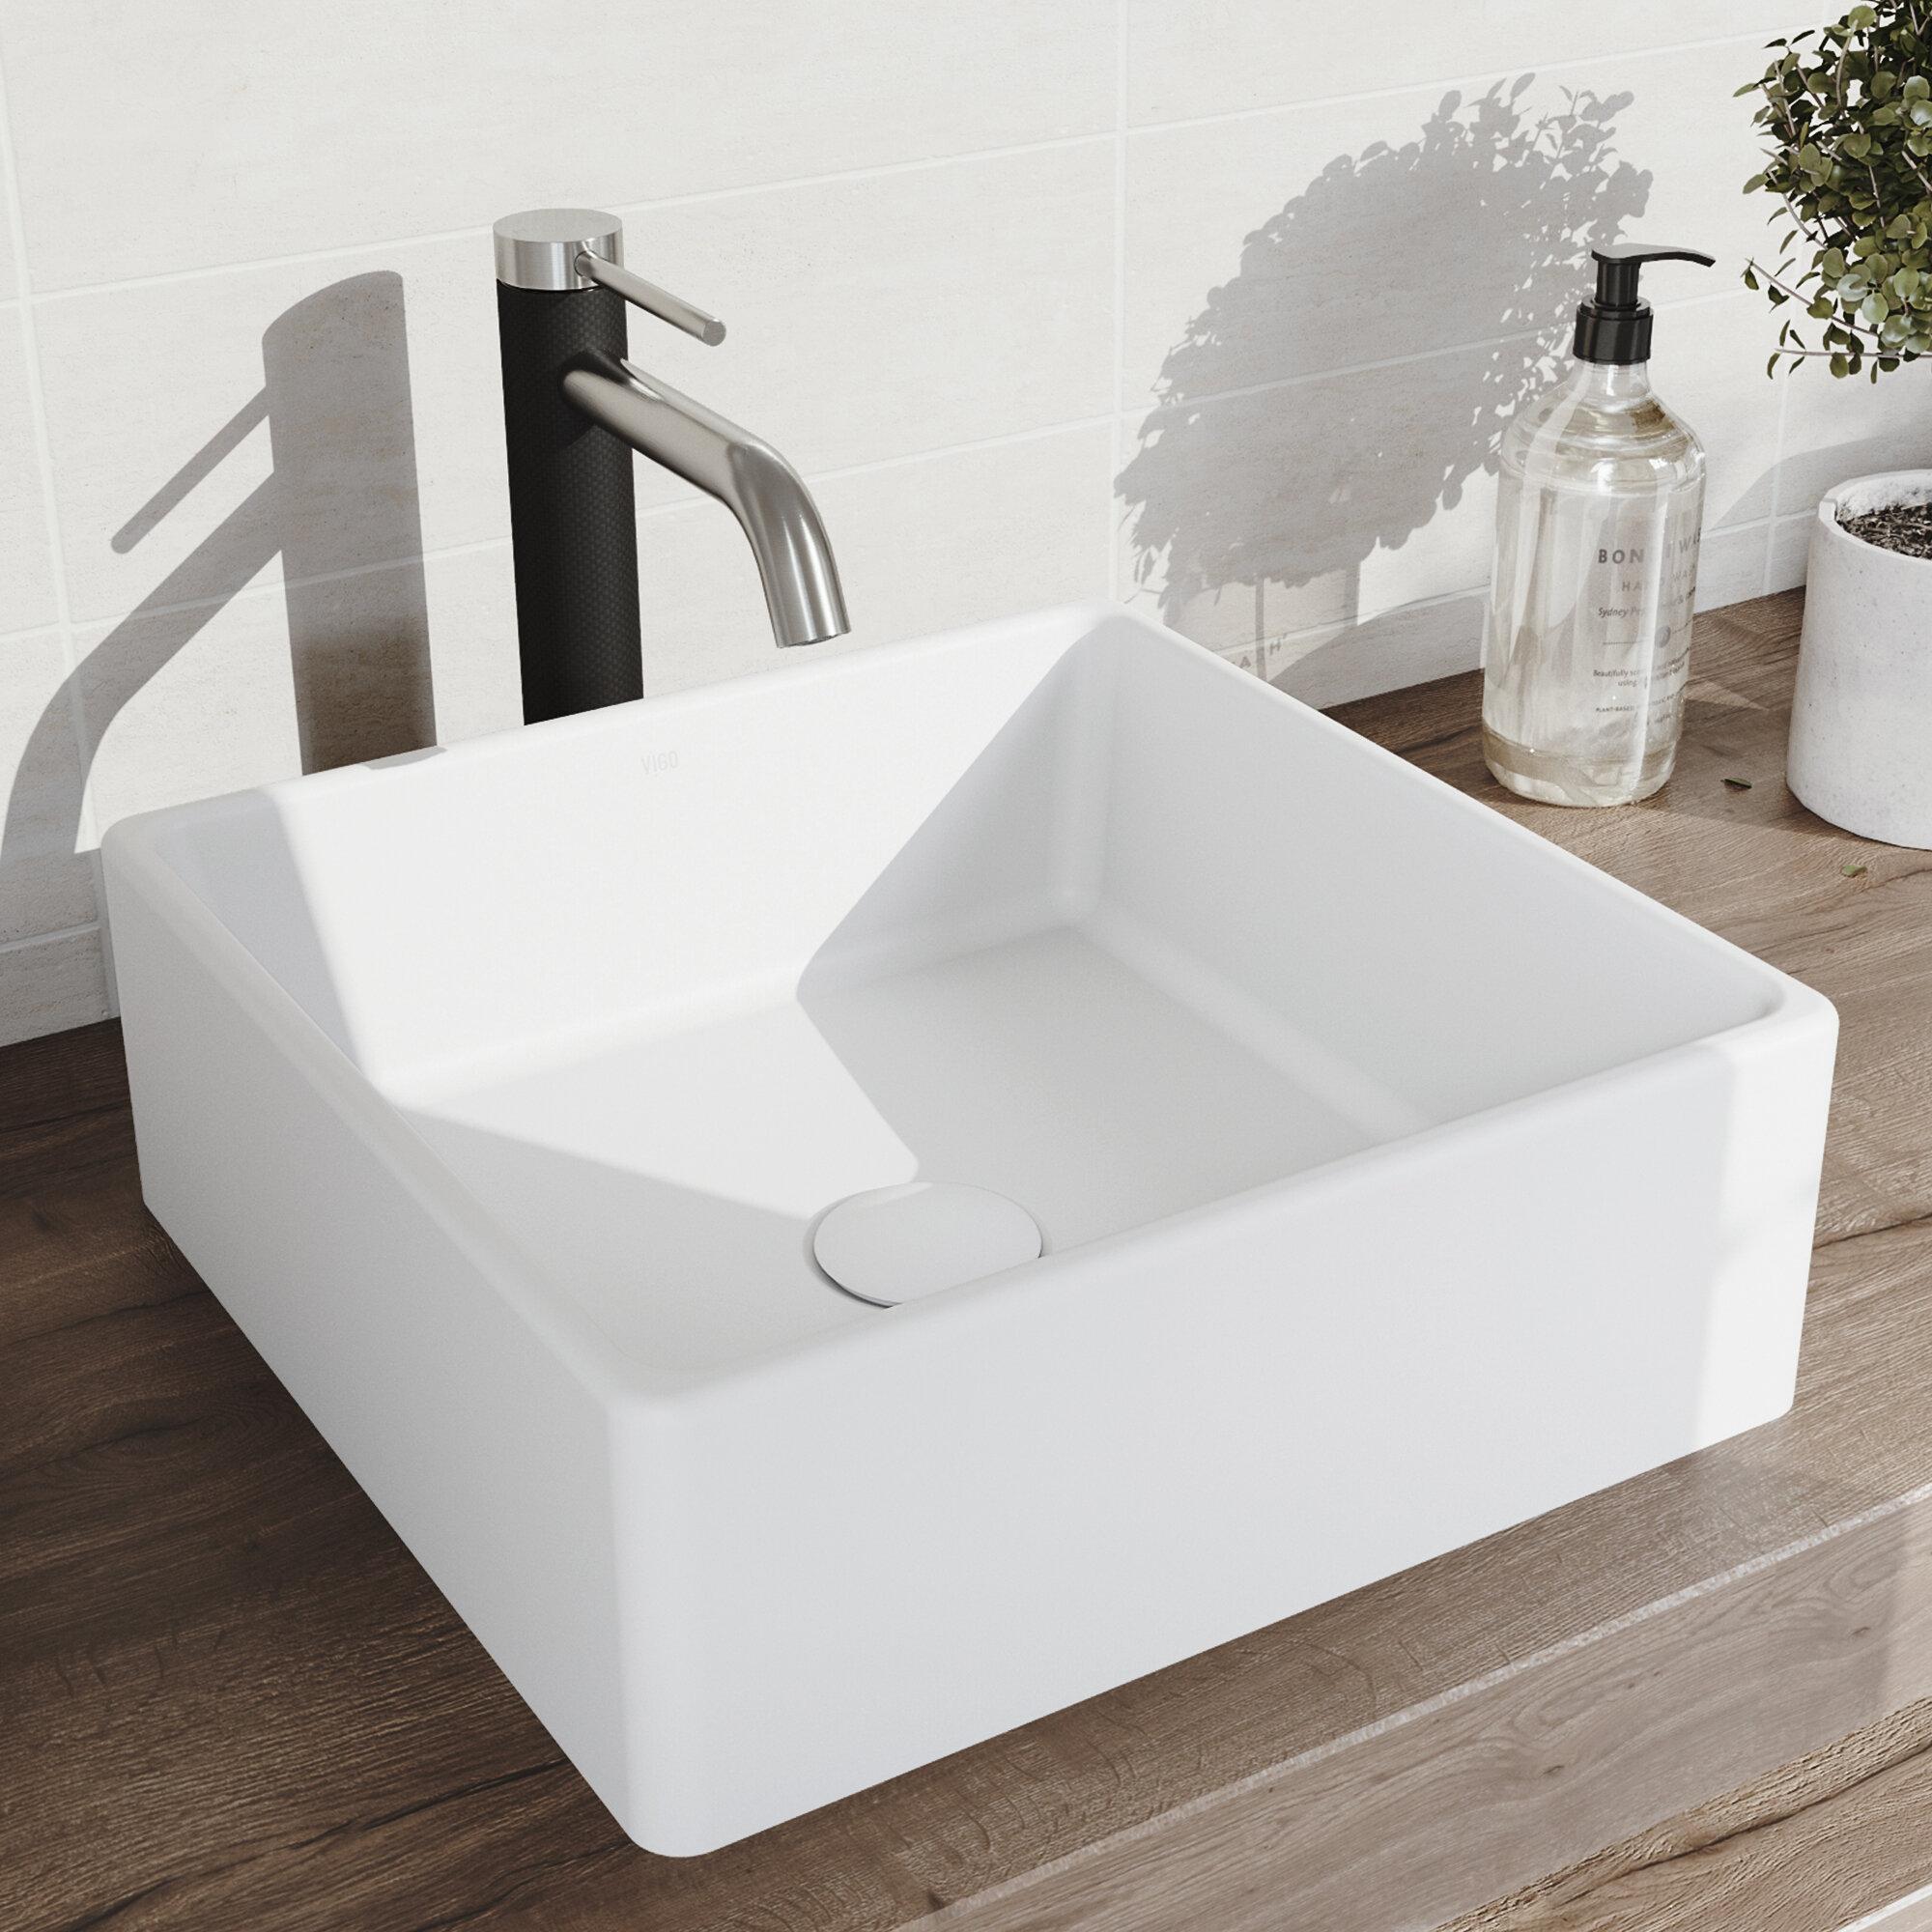 Vigo Dianthus Stone Square Vessel Bathroom Sink With Faucet Reviews Wayfair